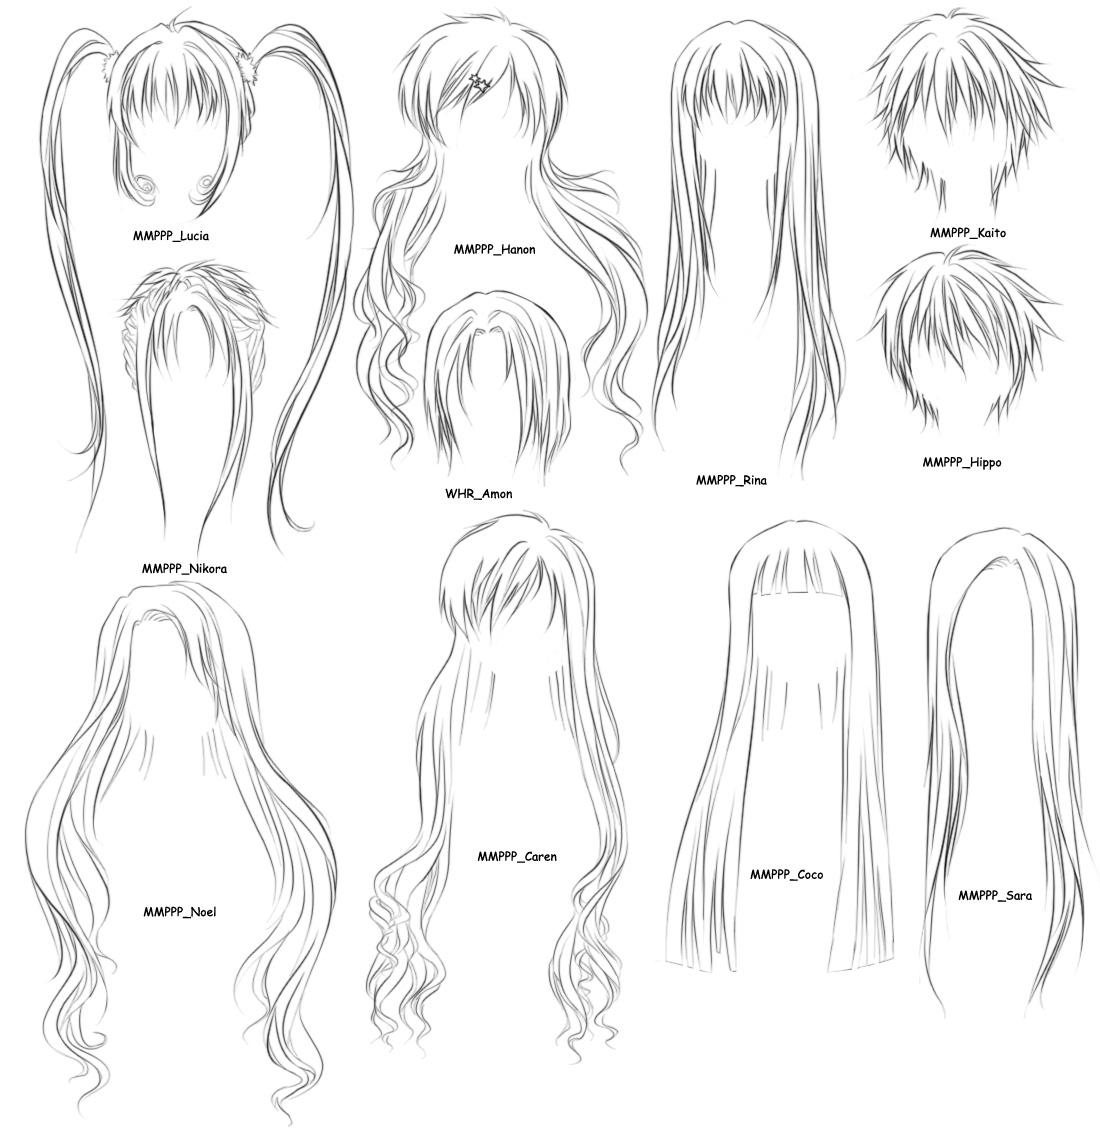 Anime hair brushes 2